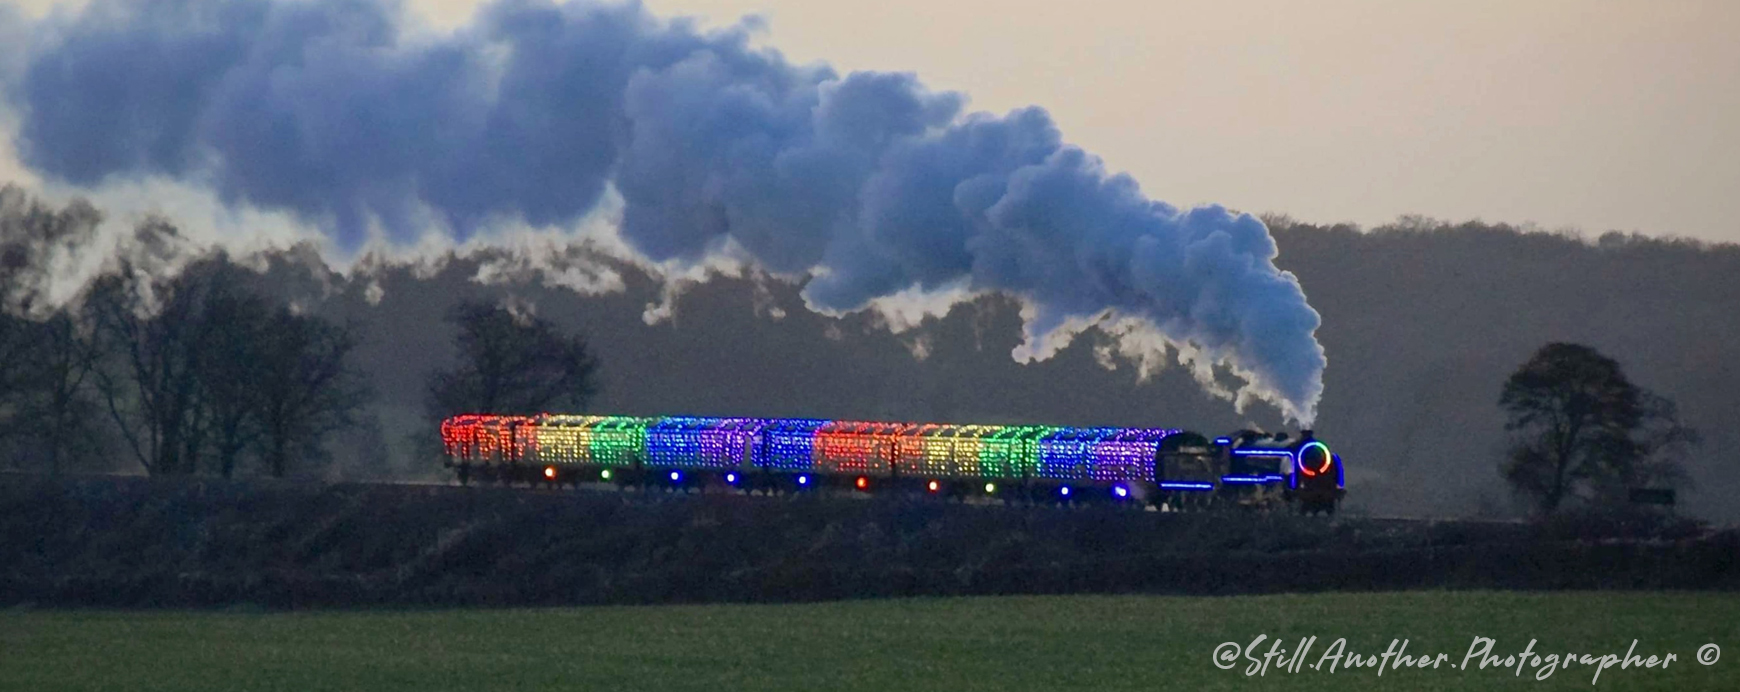 Steam Illuminations with LEDJ